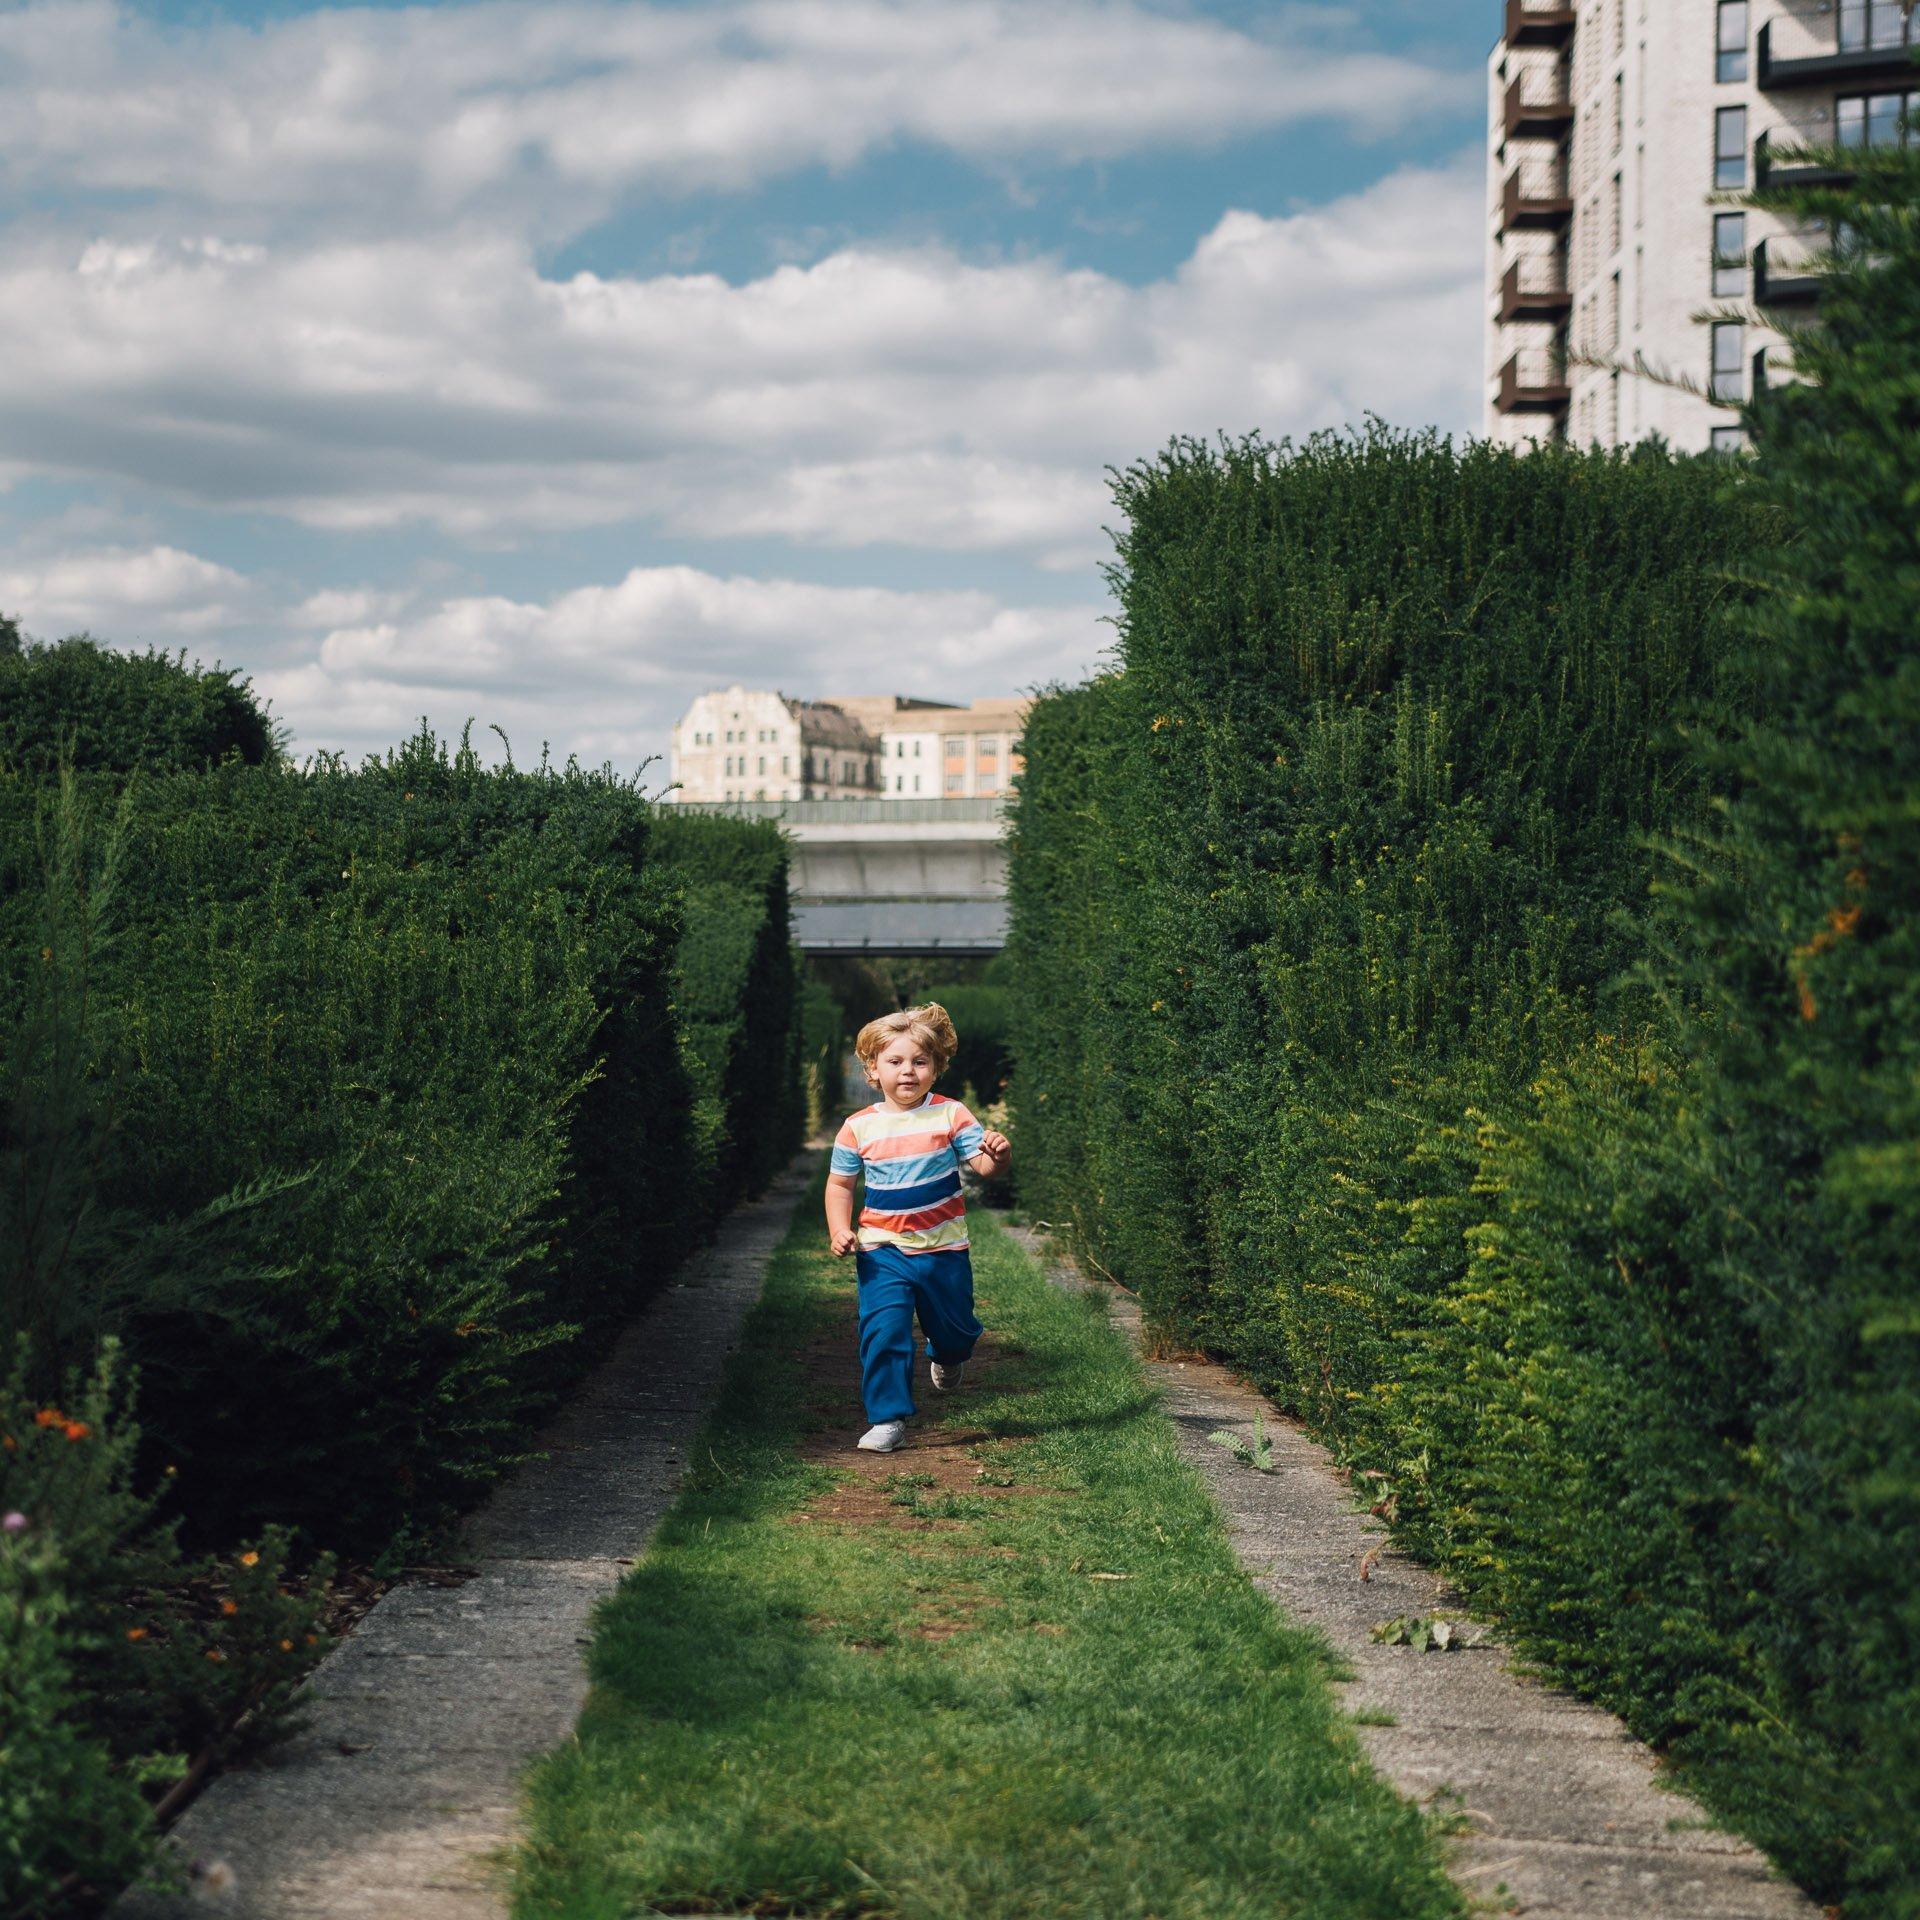 boy running in a park